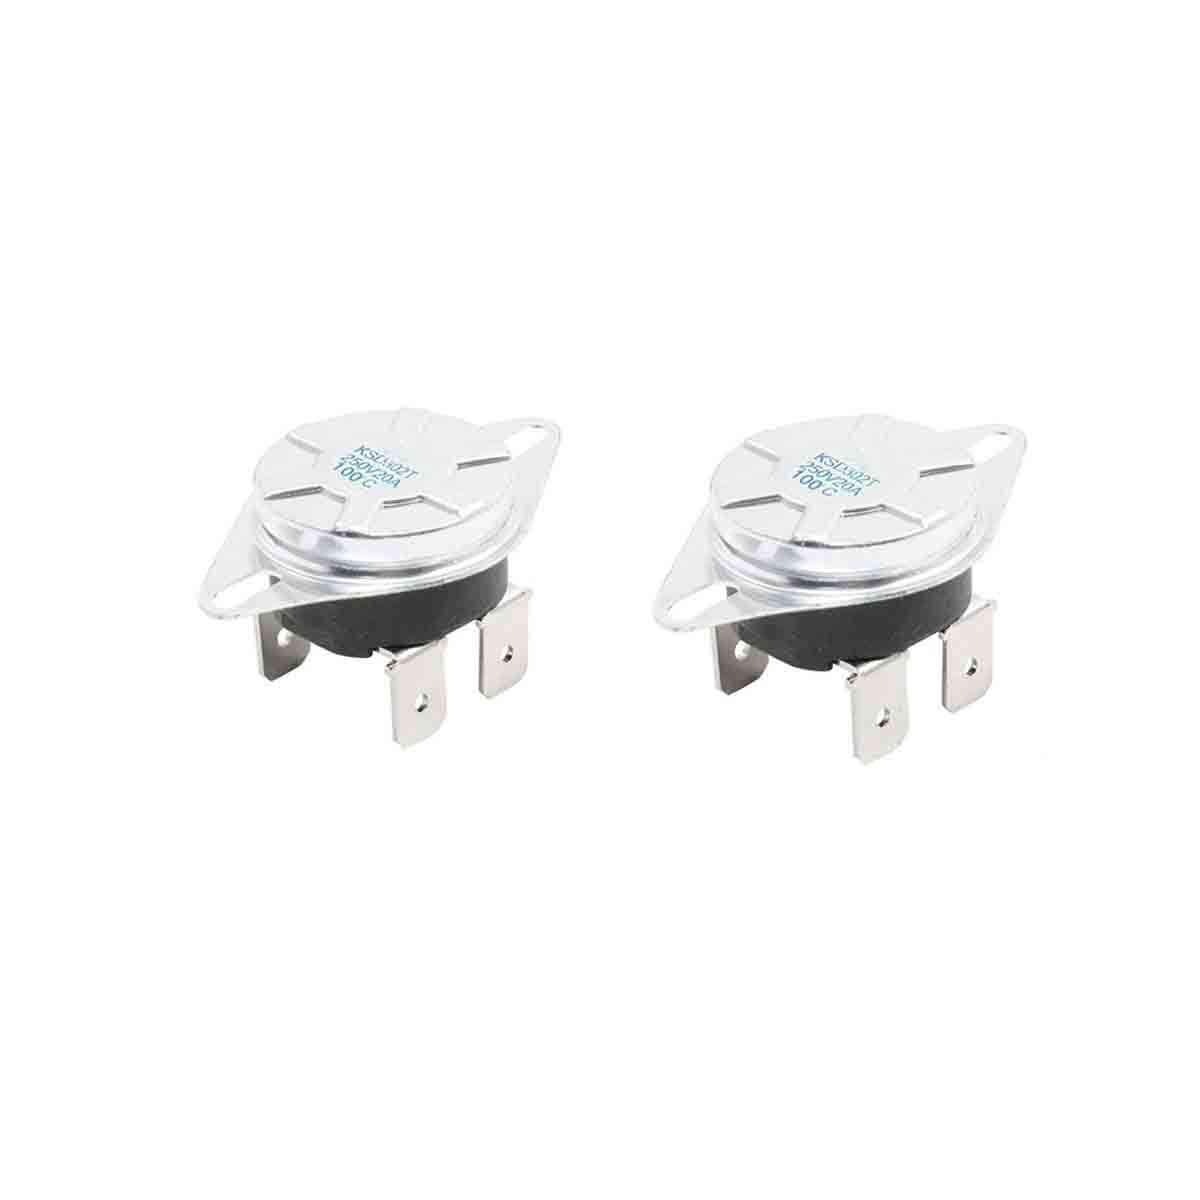 COMOK KSD302T 100 Celsius Manual Reset Thermostat For Household Electric Appliances 2Pcs